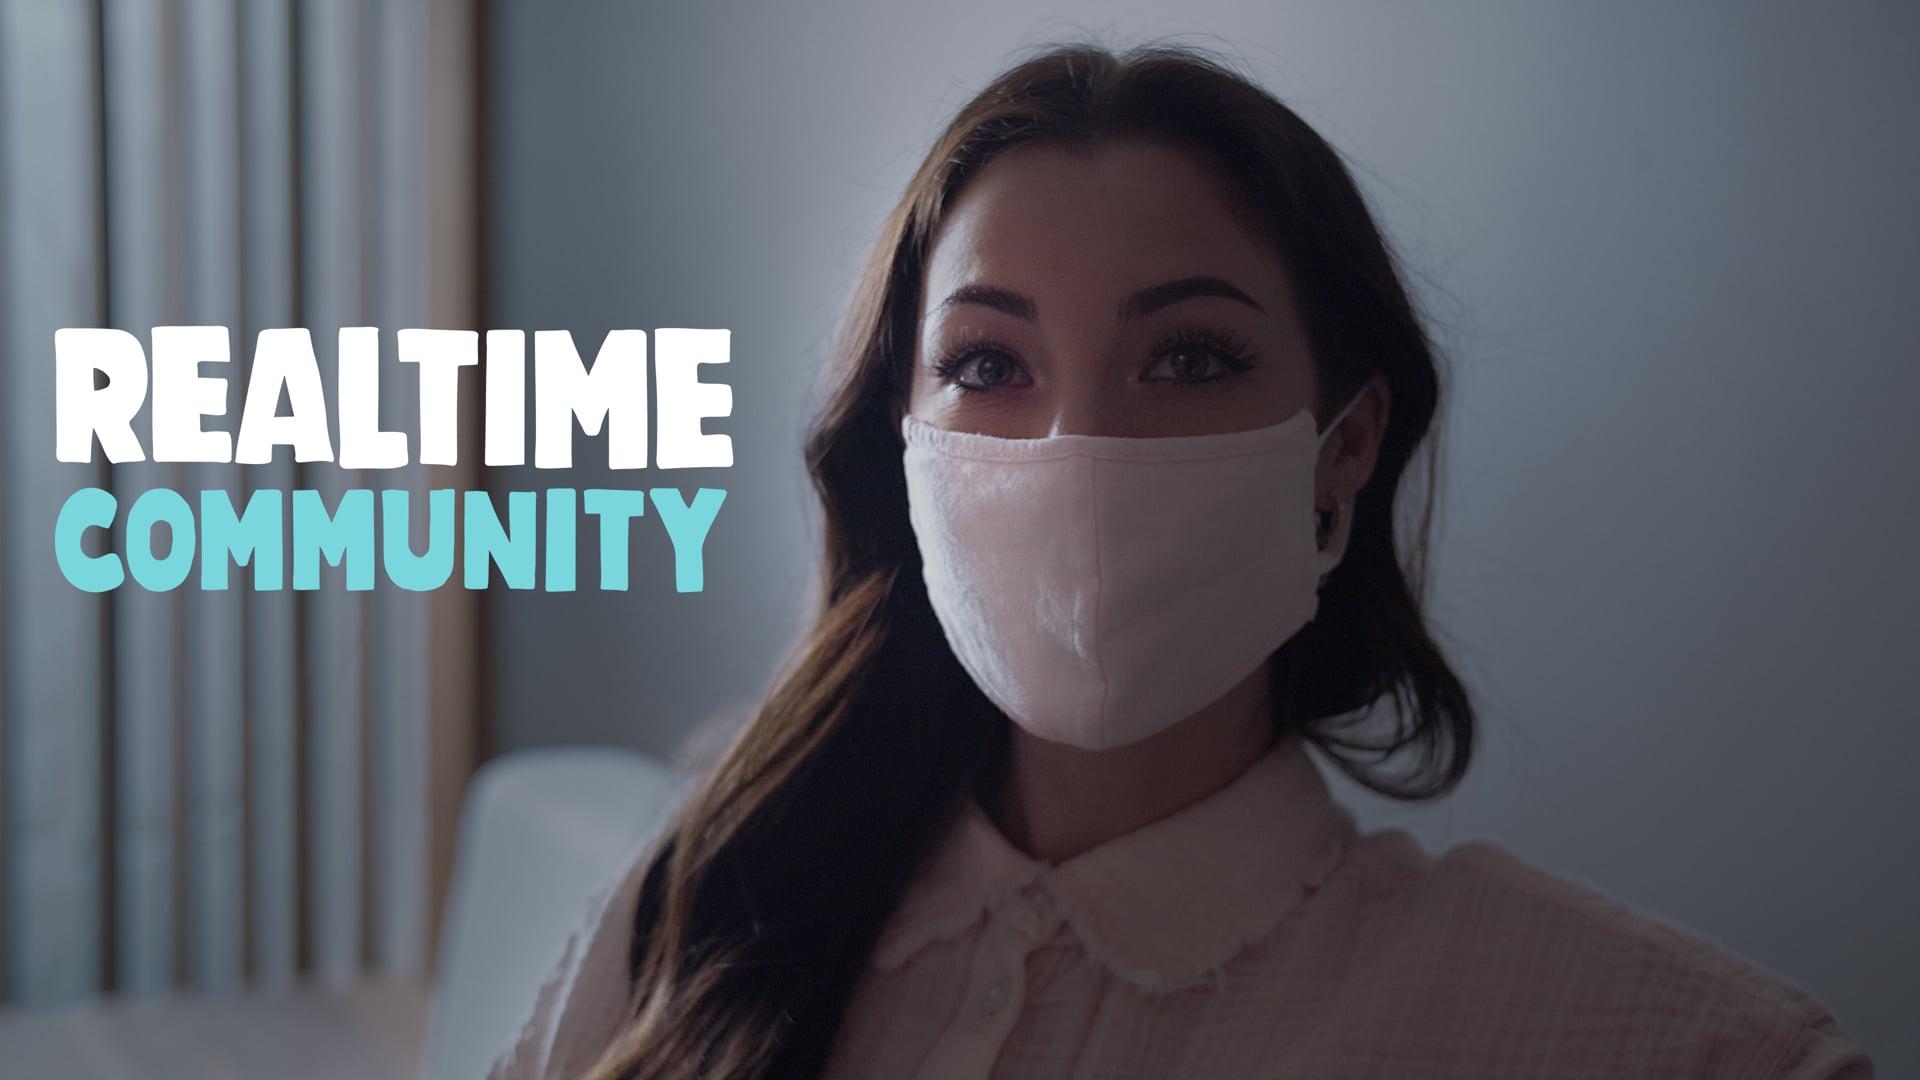 RealTime Community 2020 // Kaiser Permanente